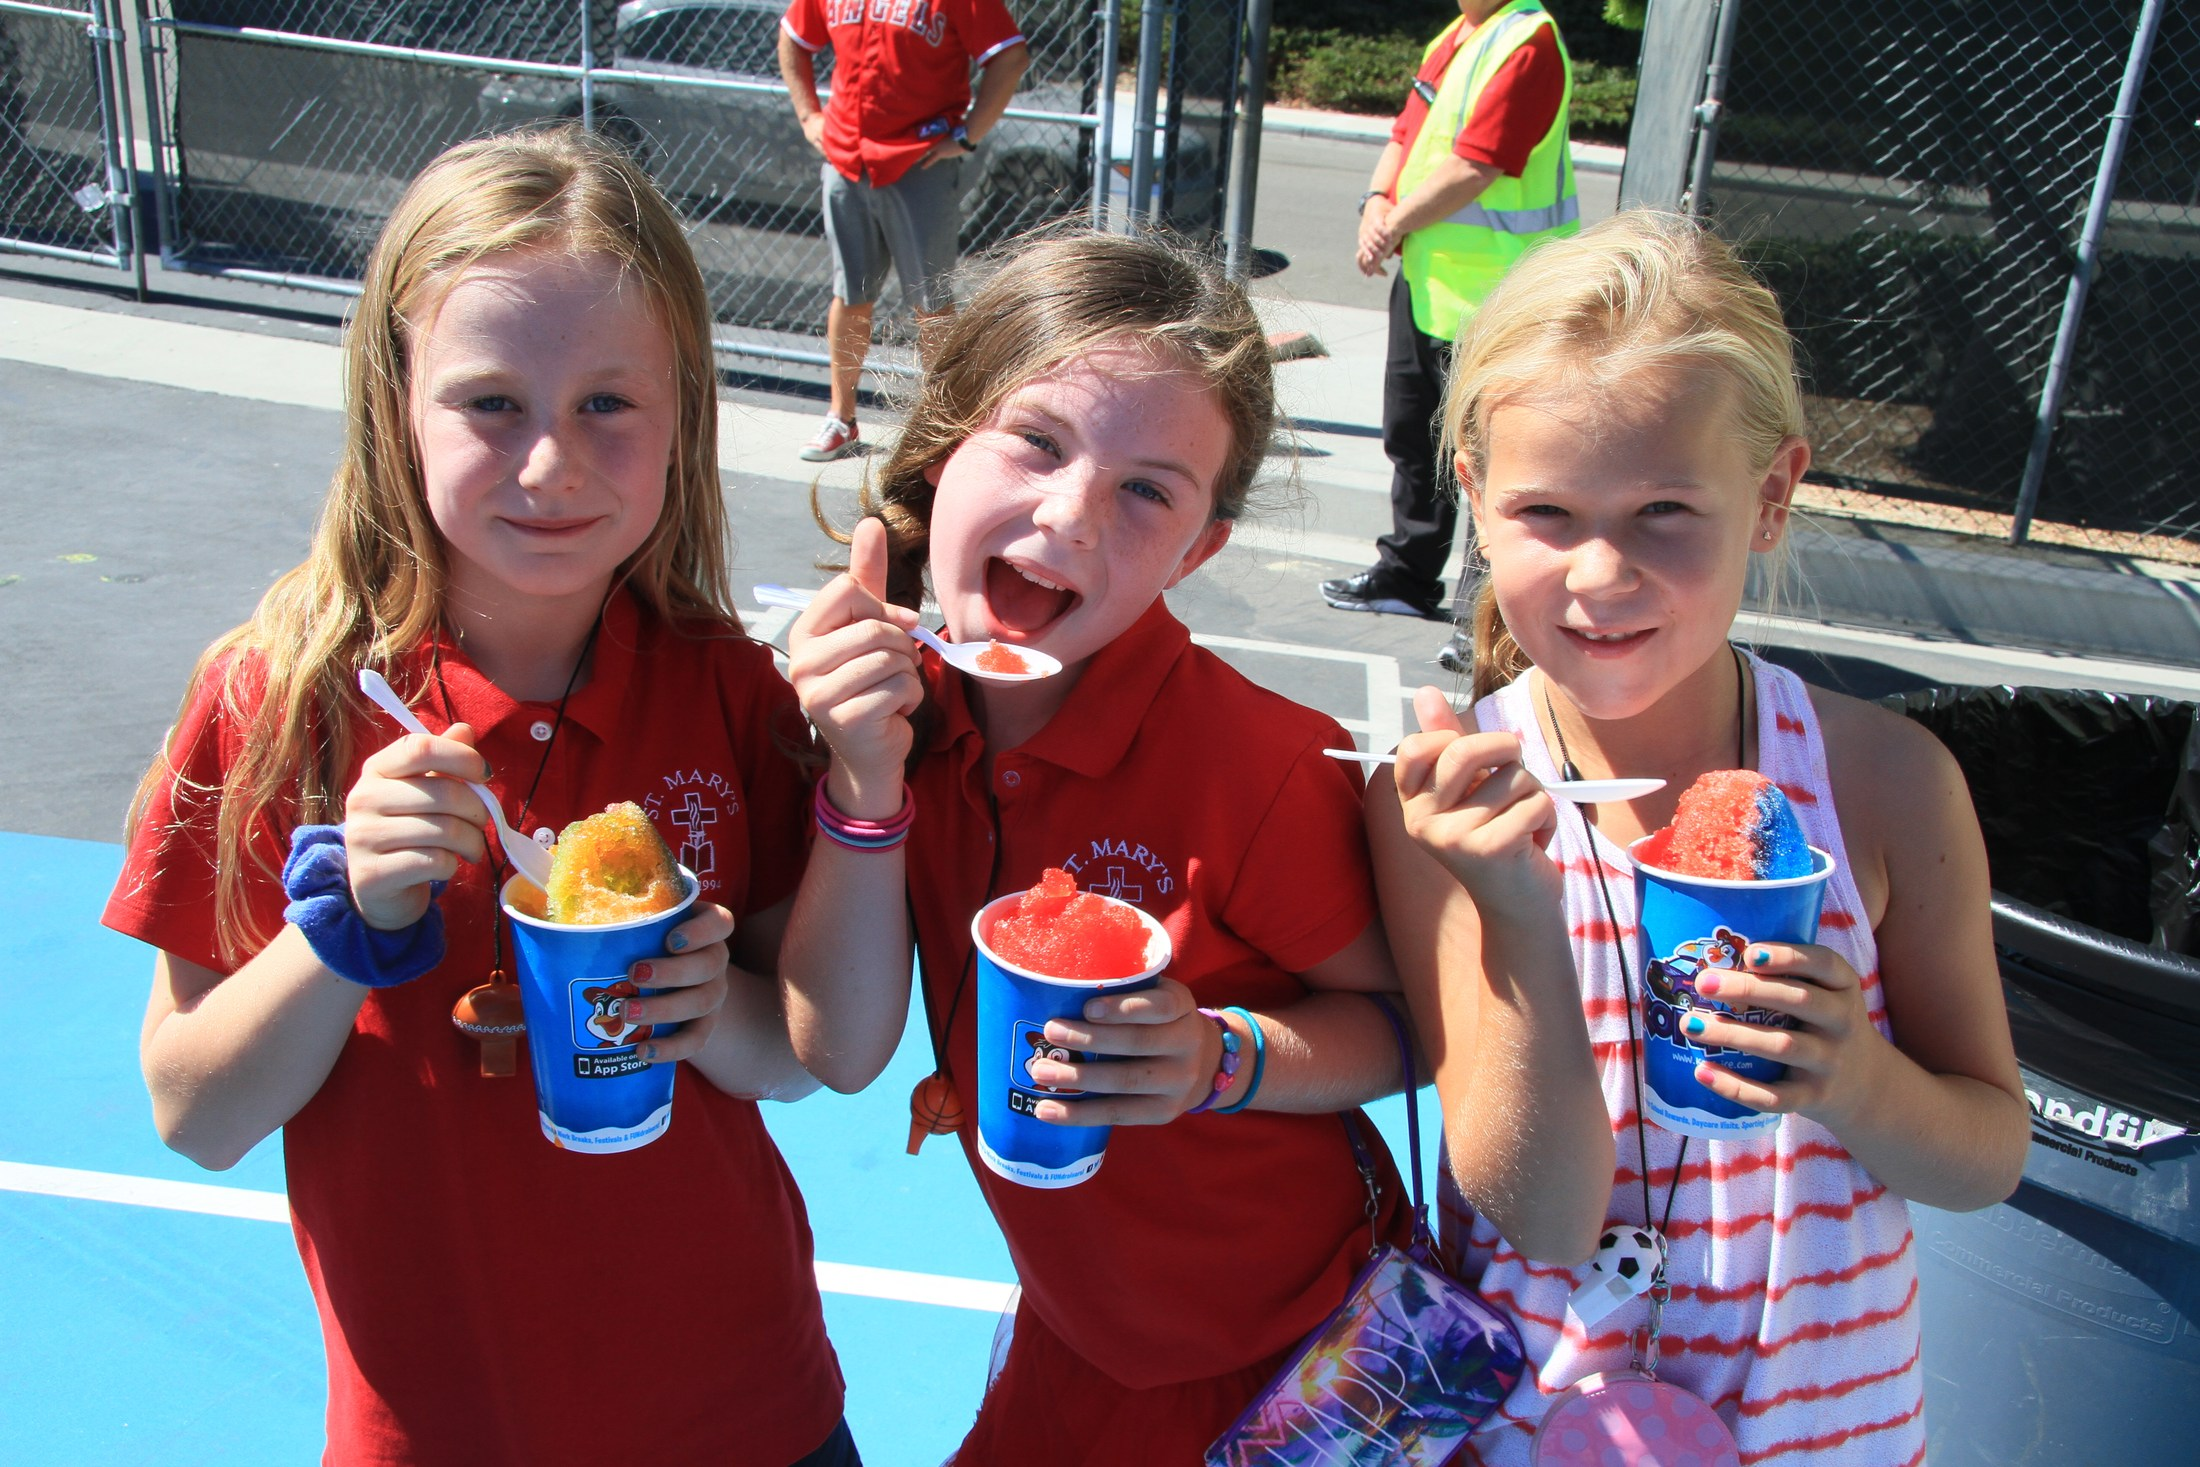 Summer Resort Photo of 3 girls eating shaved ice